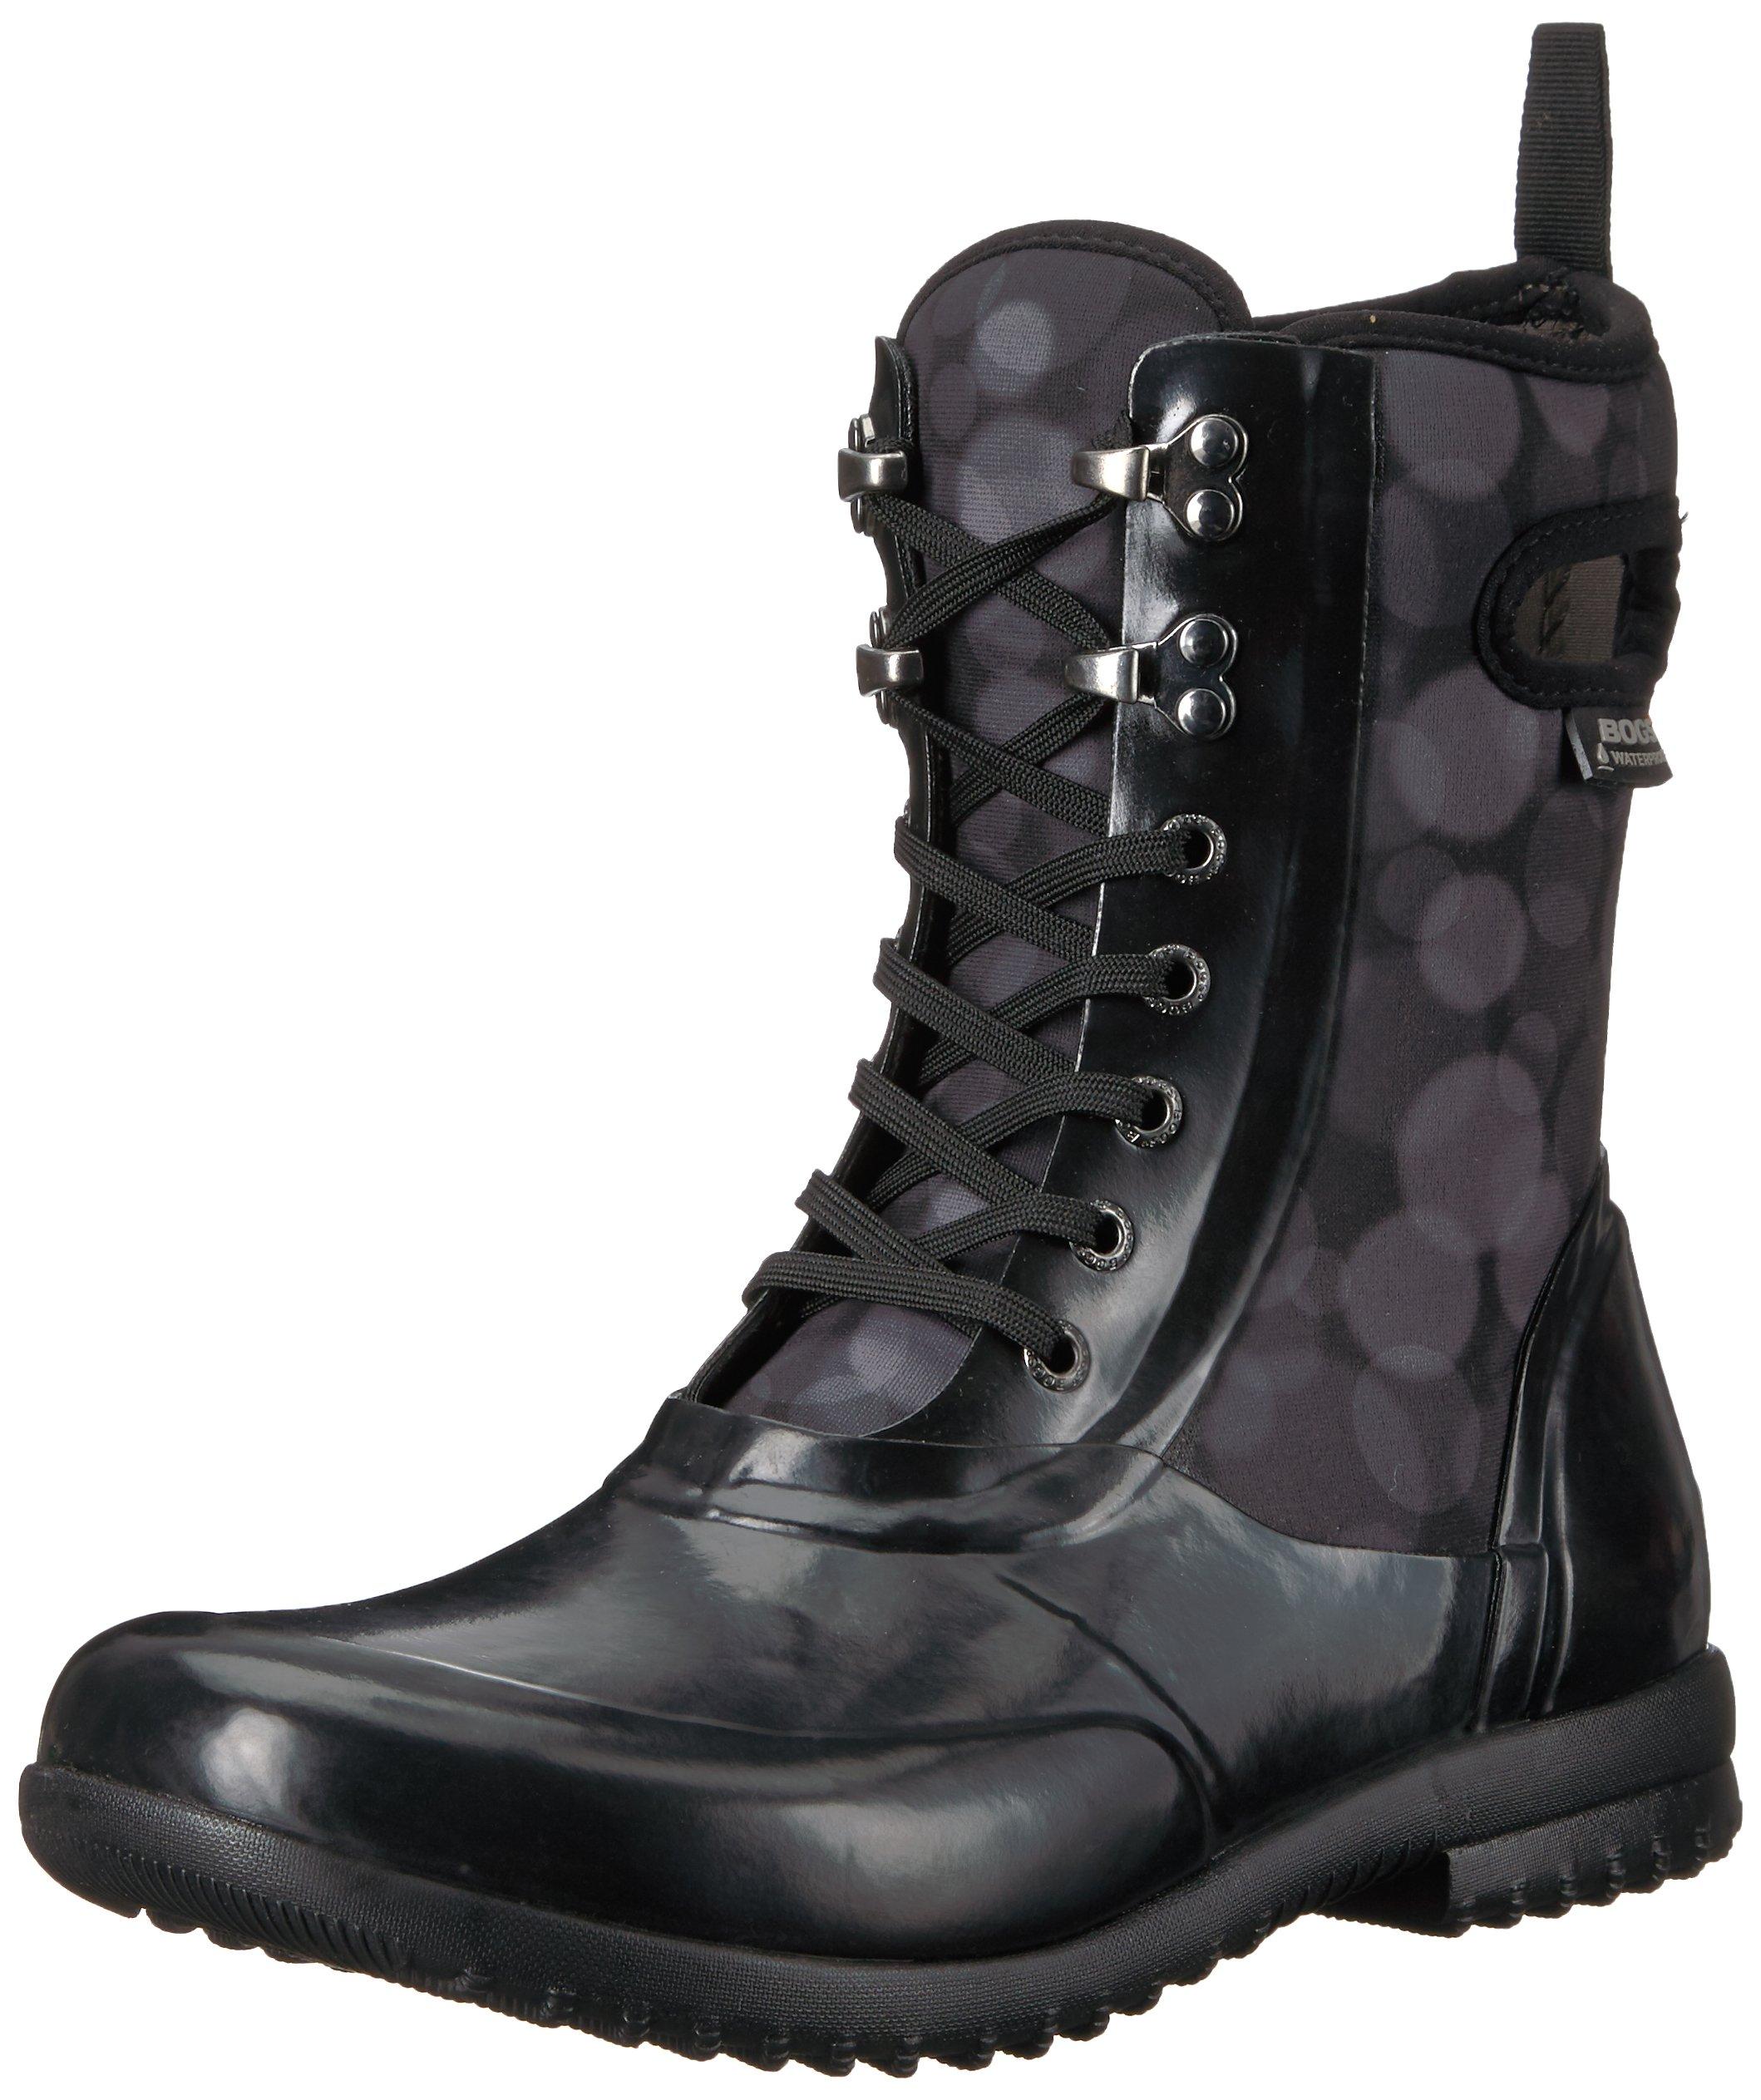 Bogs Women's Sidney Lace Rain Snow Boot,Black/Multi,7 M US